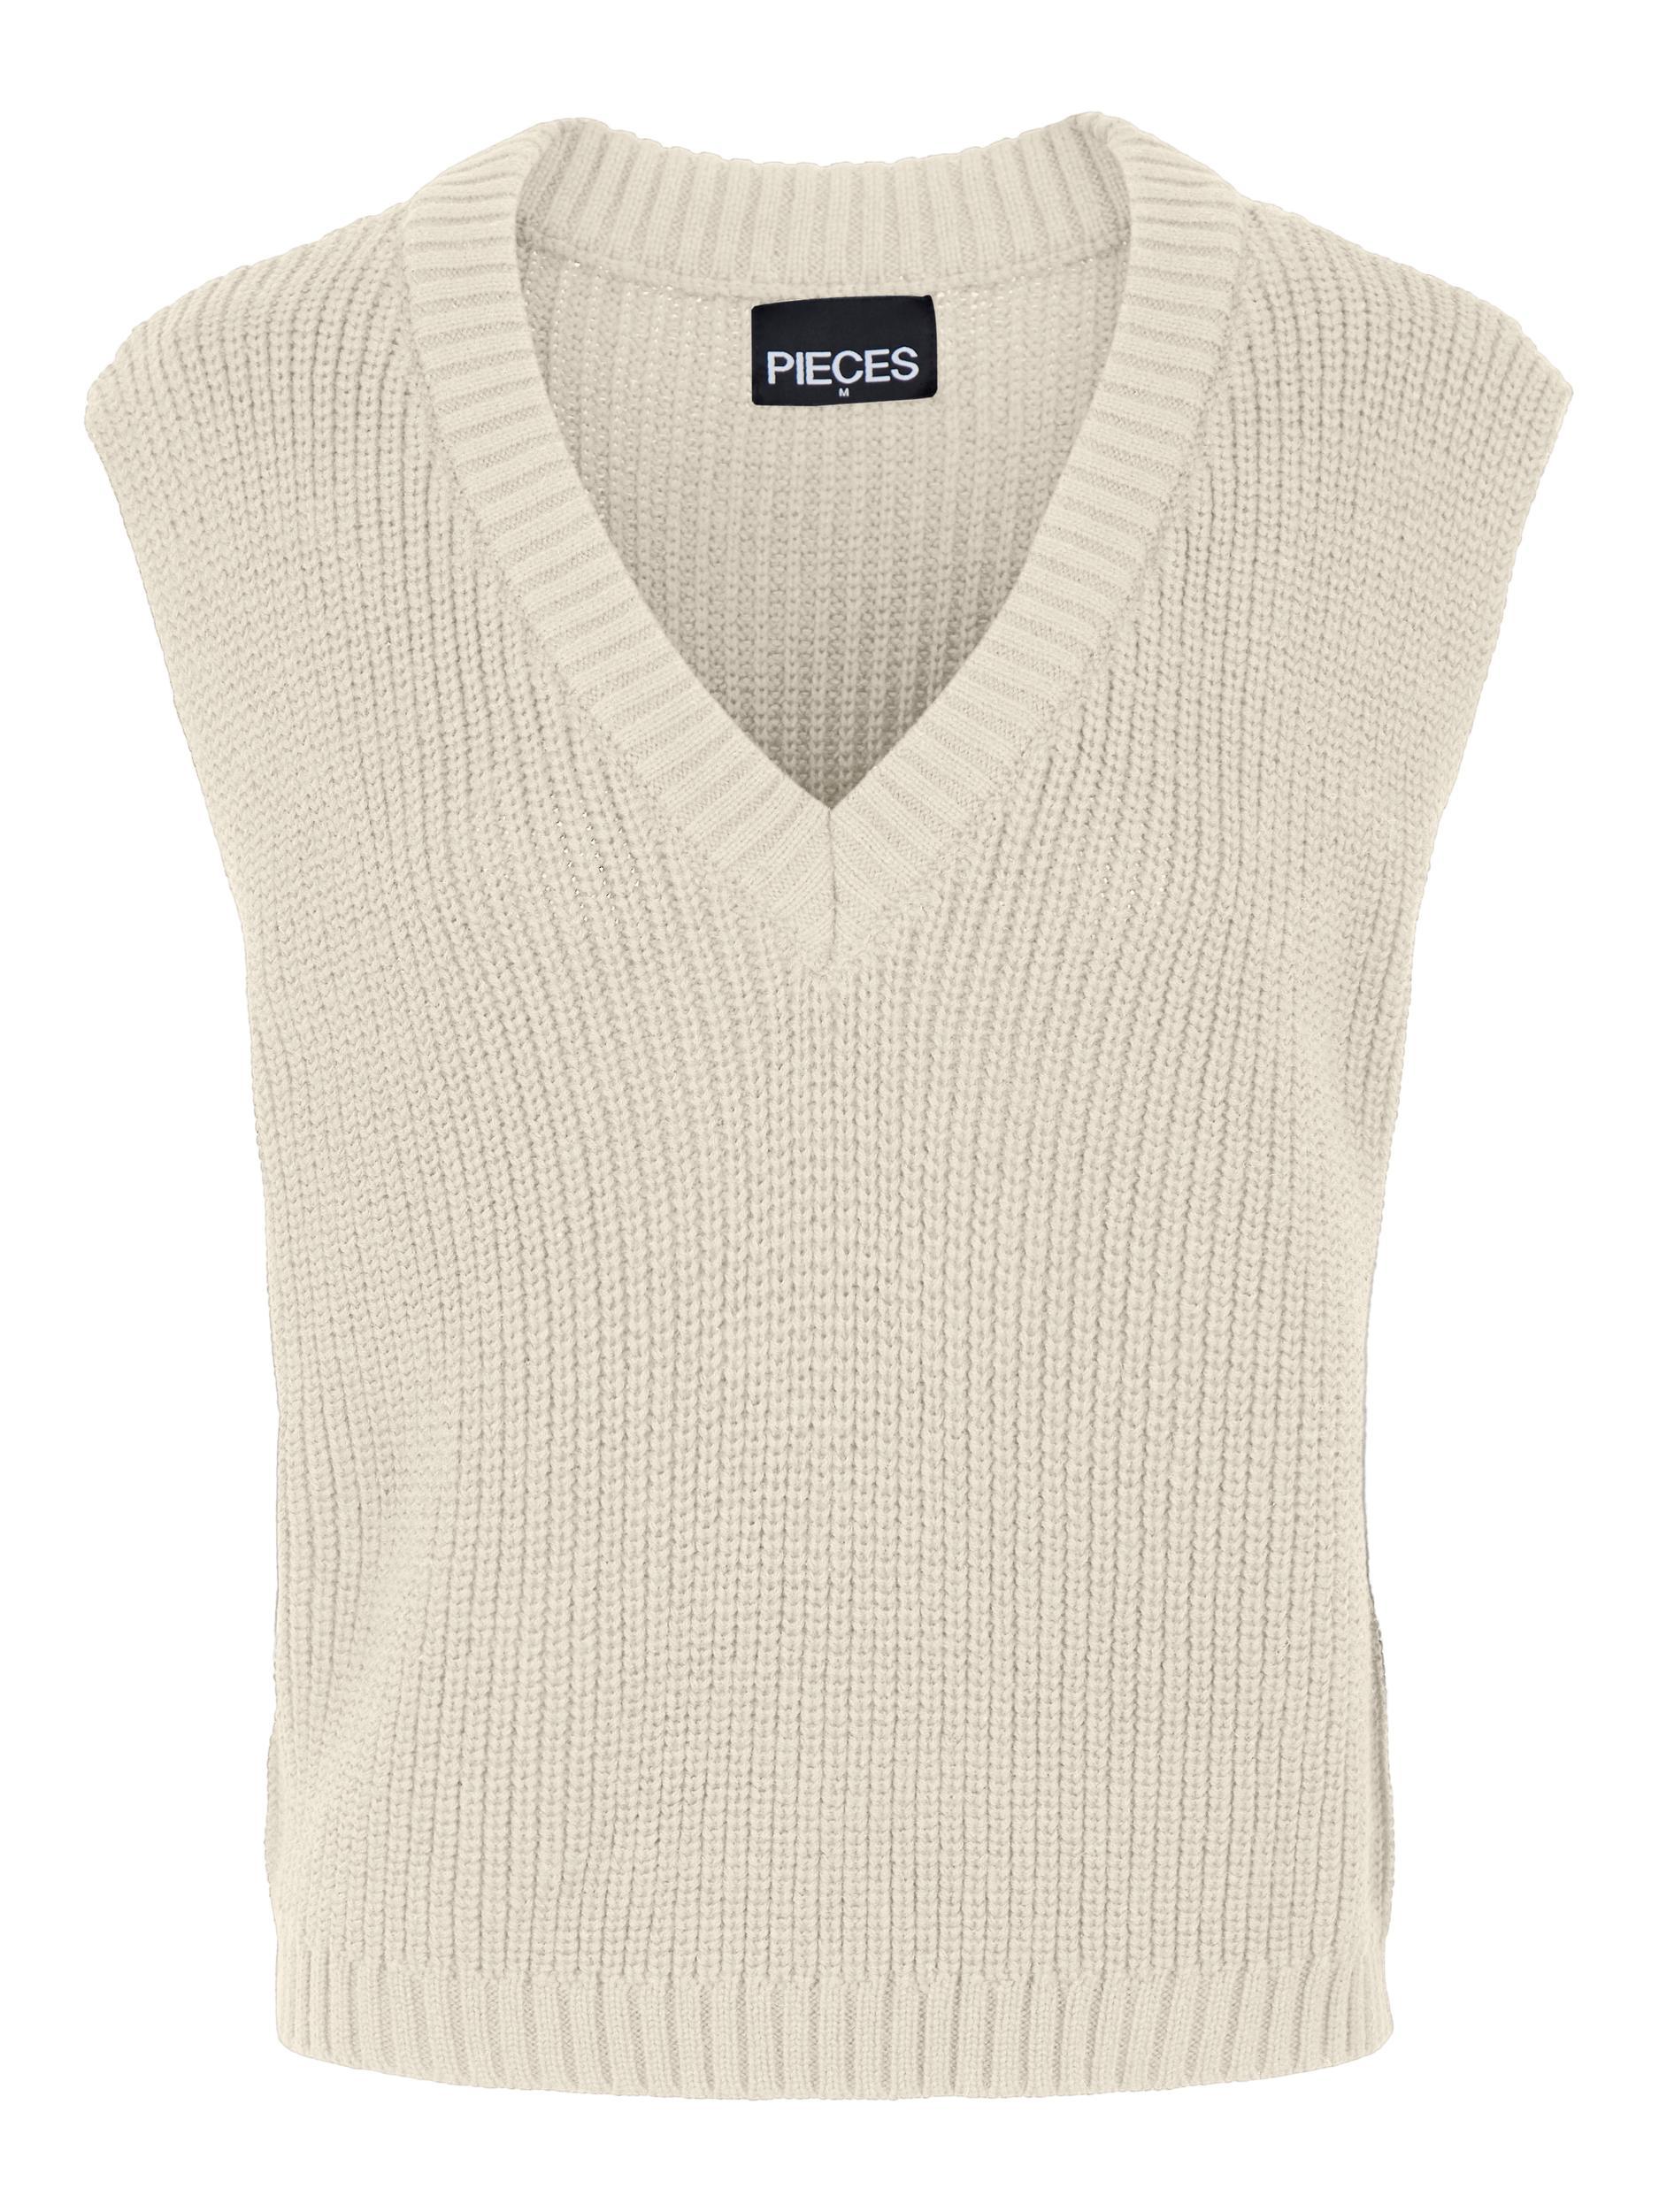 Pieces Carole V-Neck vest, birch, x-large